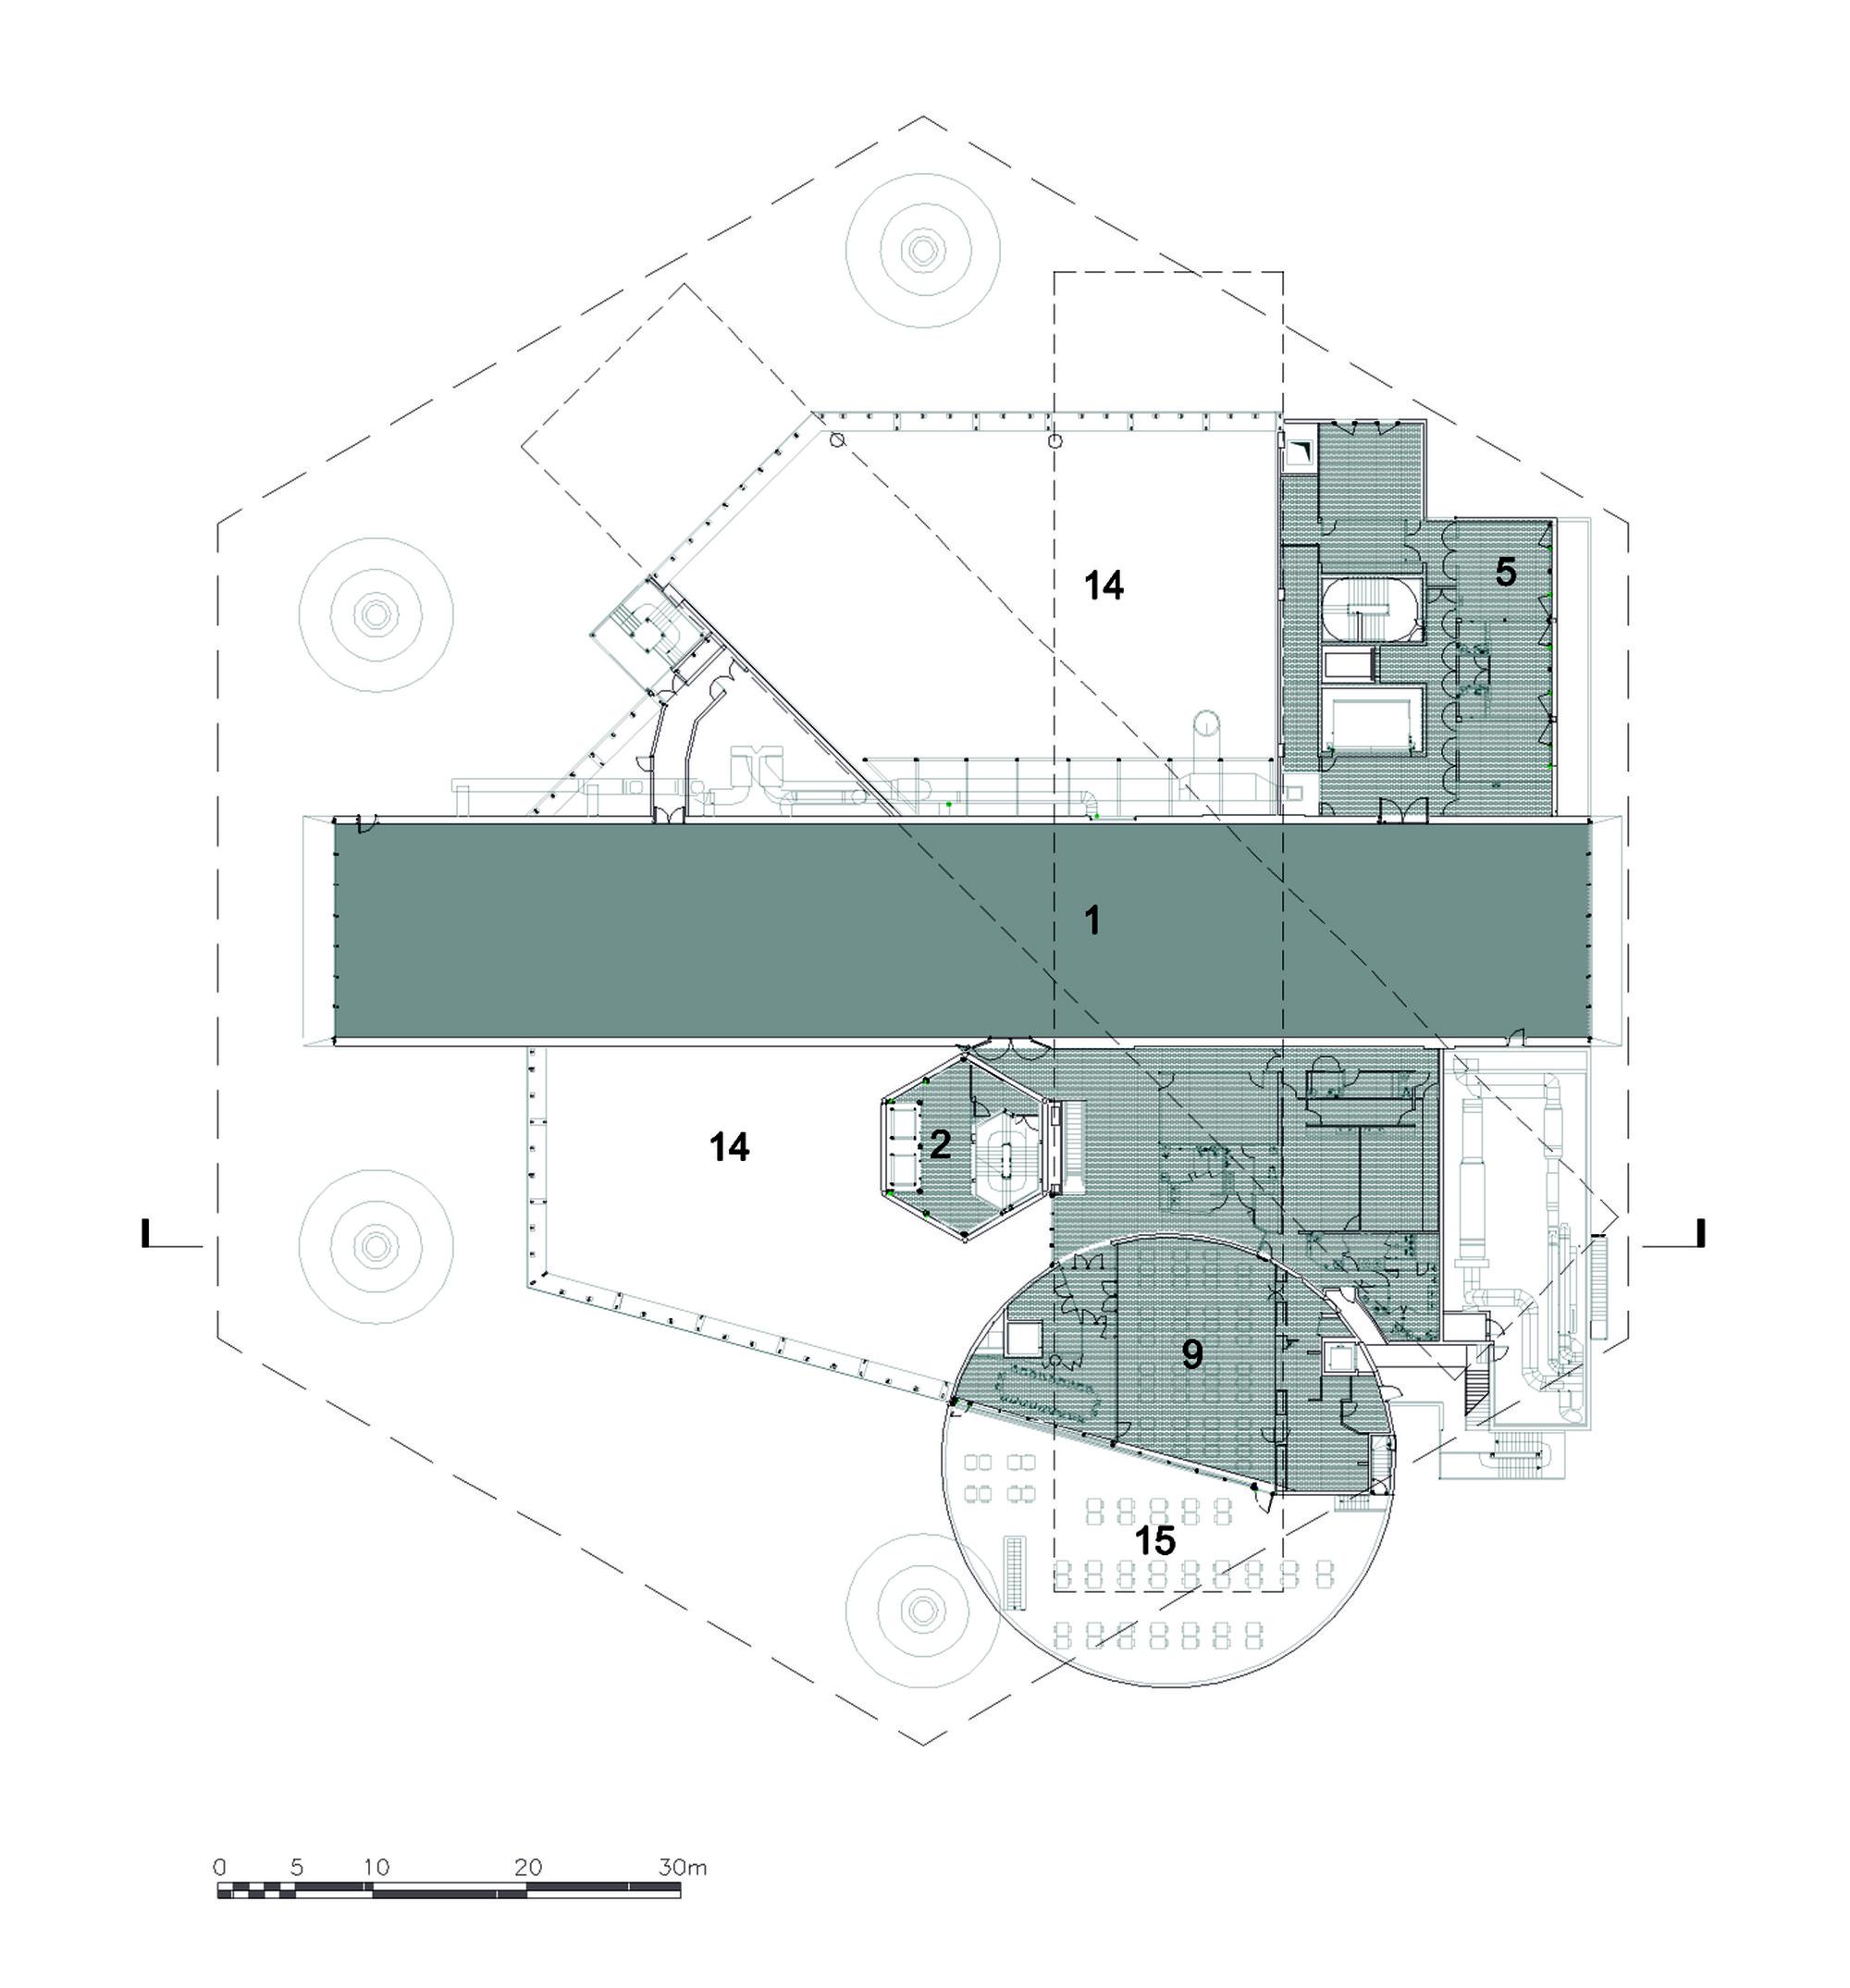 The Metz Floor Plan Galer 237 A De Centre Pompidou Metz Shigeru Ban Architects 9